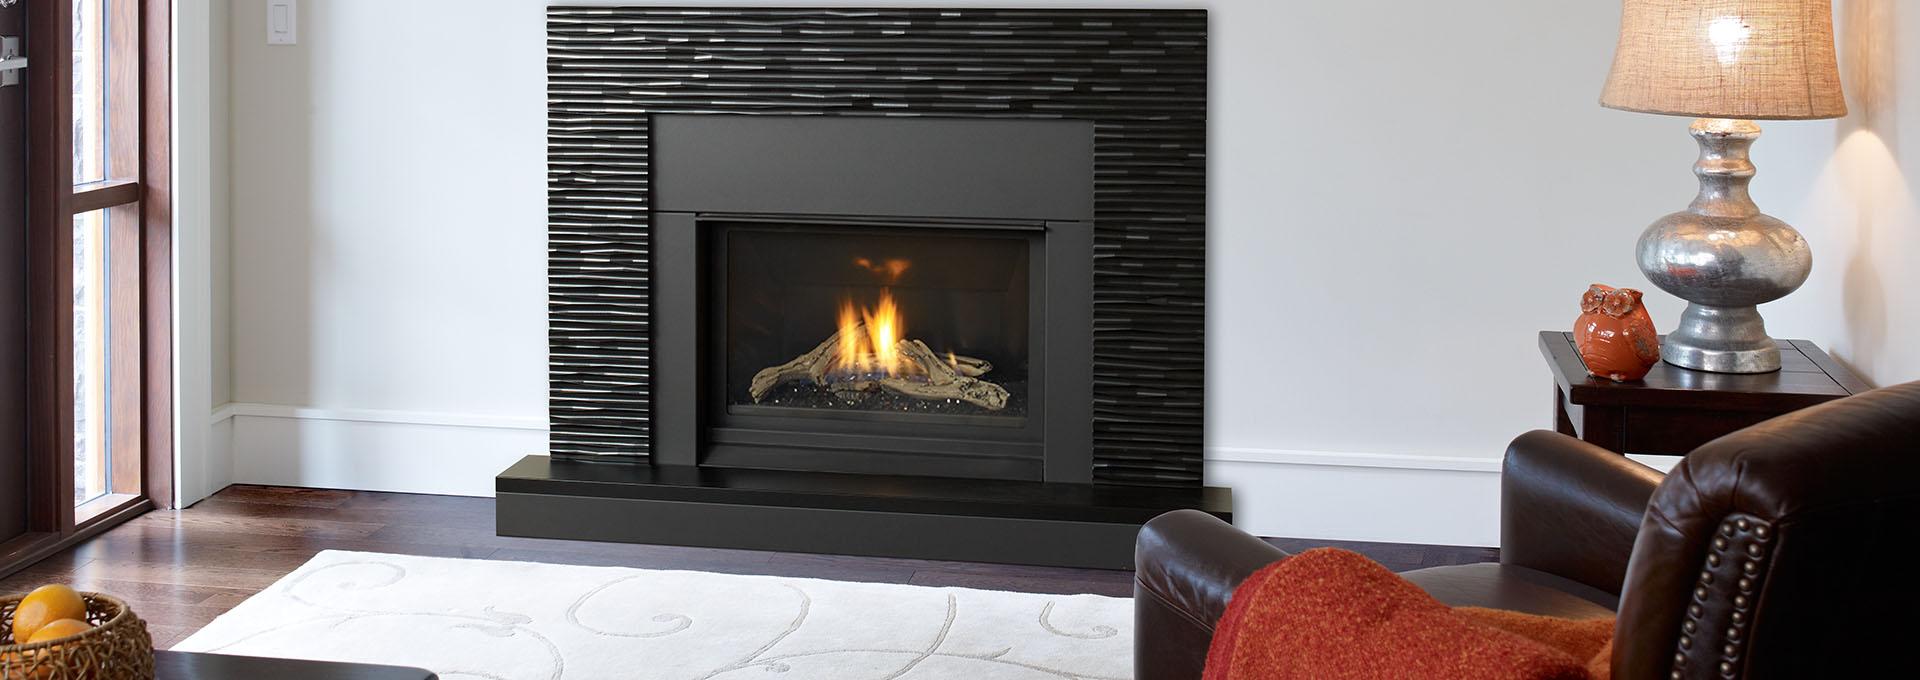 small gas fireplace stove fireplace ideas Small Gas Stoves for Heating gas fireplace small wood stove